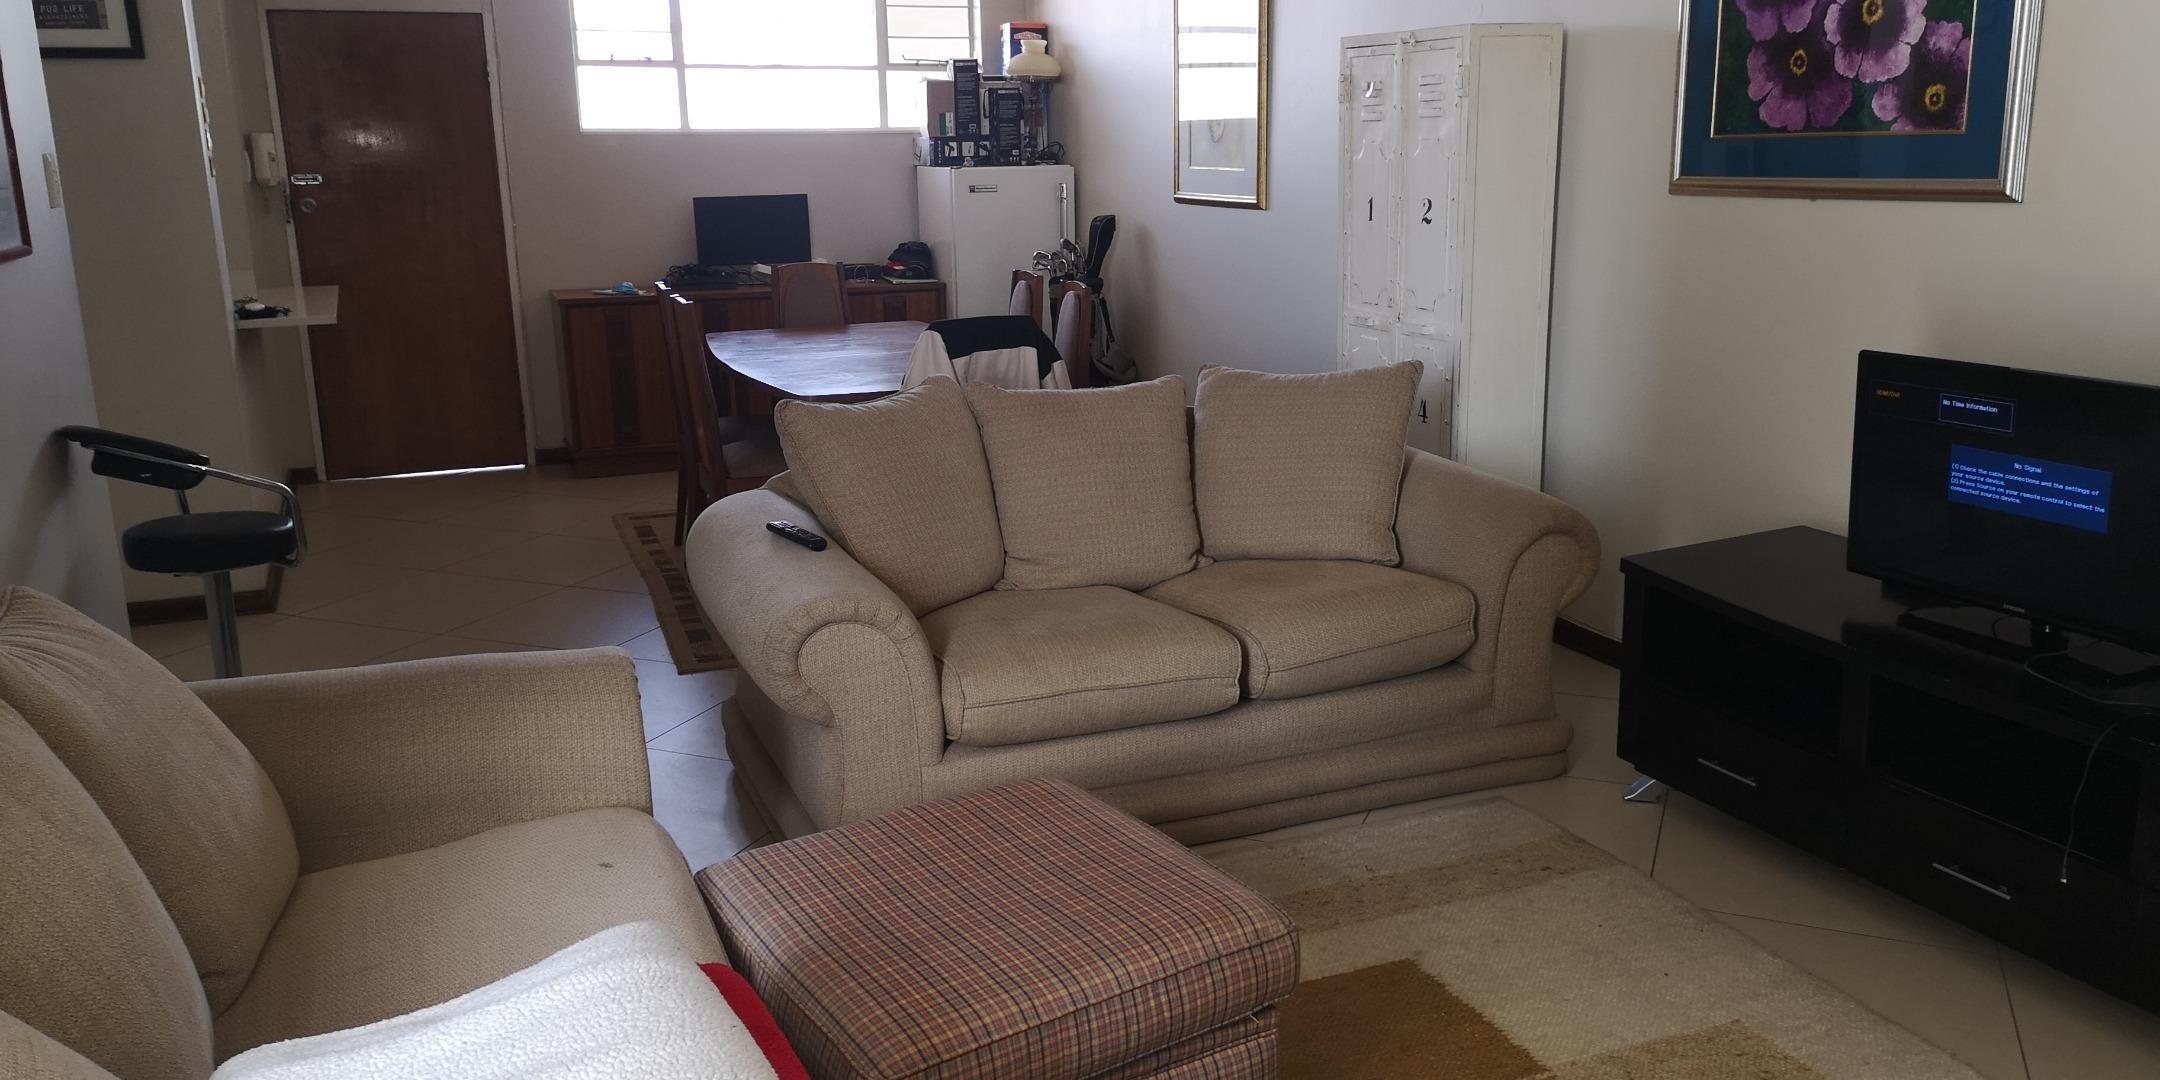 2 Bedroom Apartment / Flat For Sale in Bedfordview